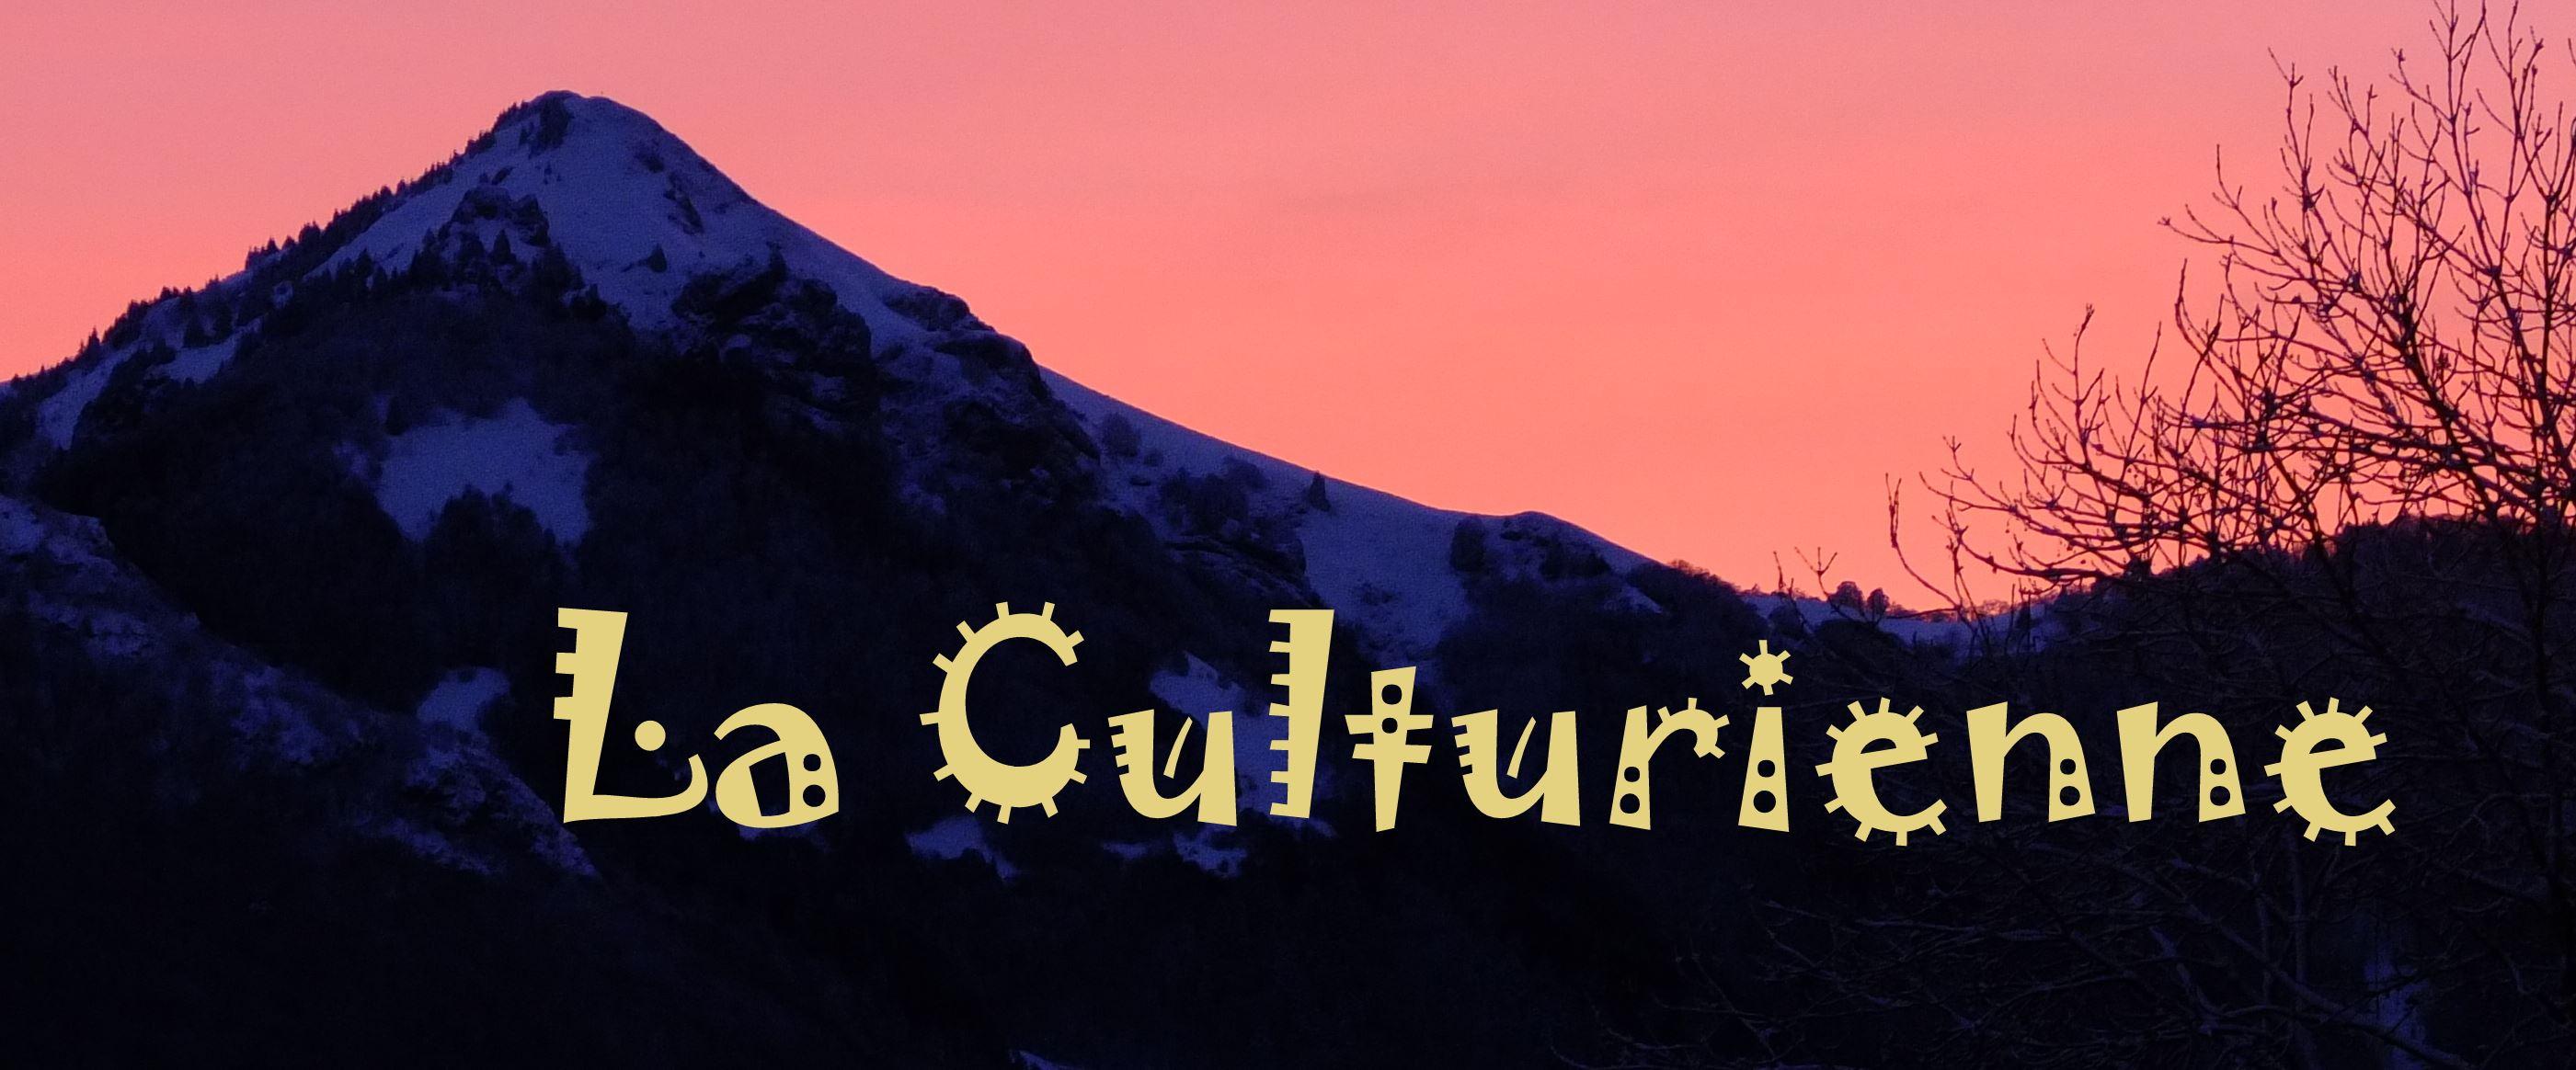 La Culturienne